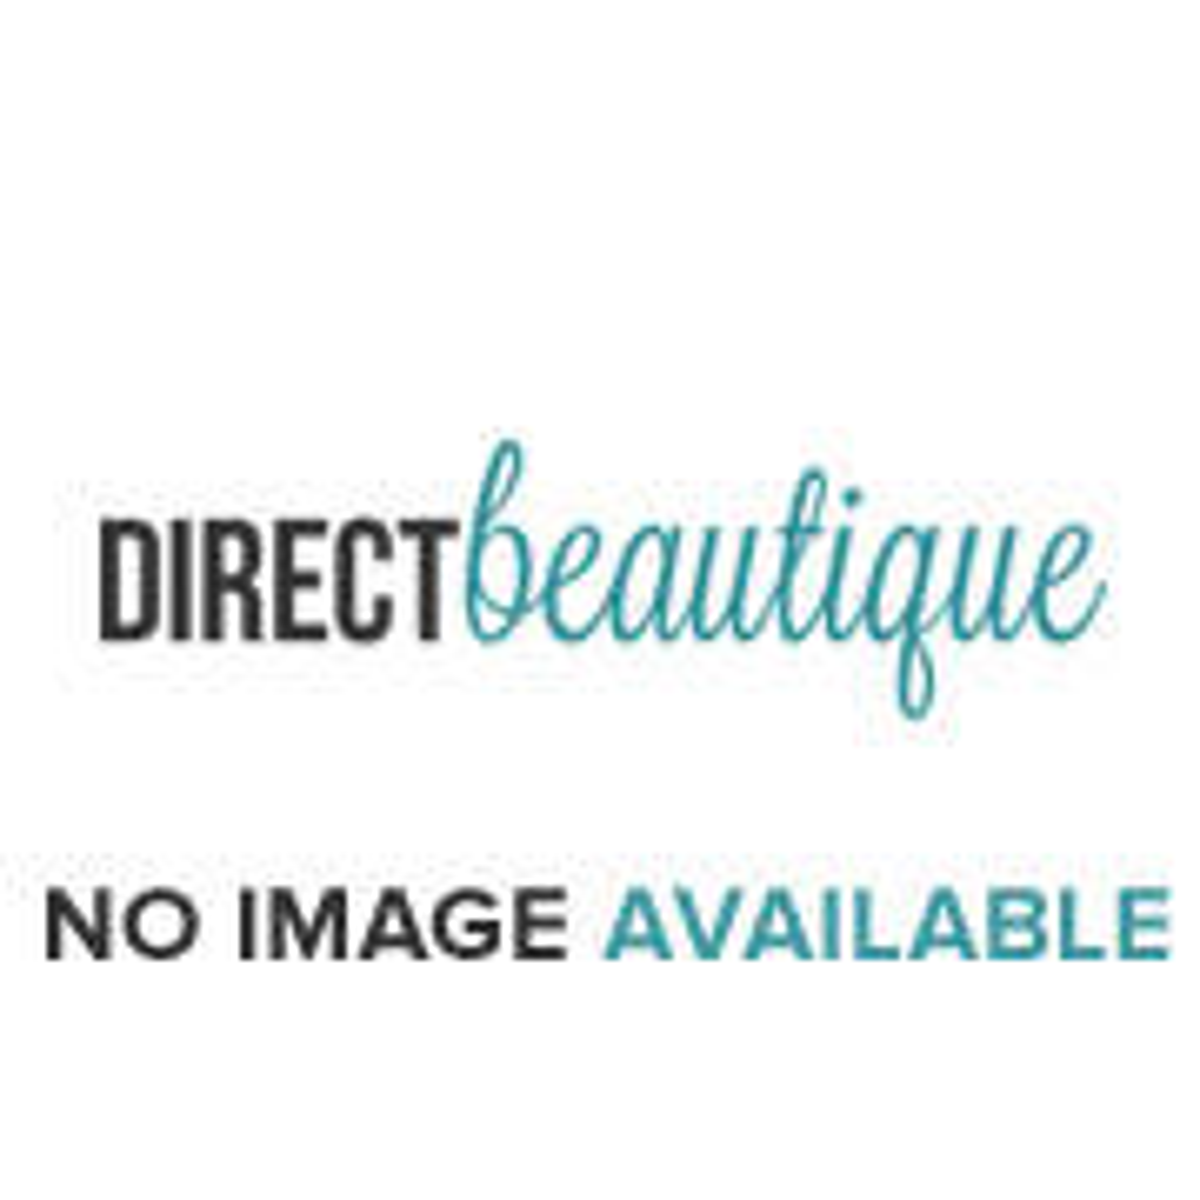 Christian Dior Eau Sauvage Extreme 100ml EDT Intense Spray